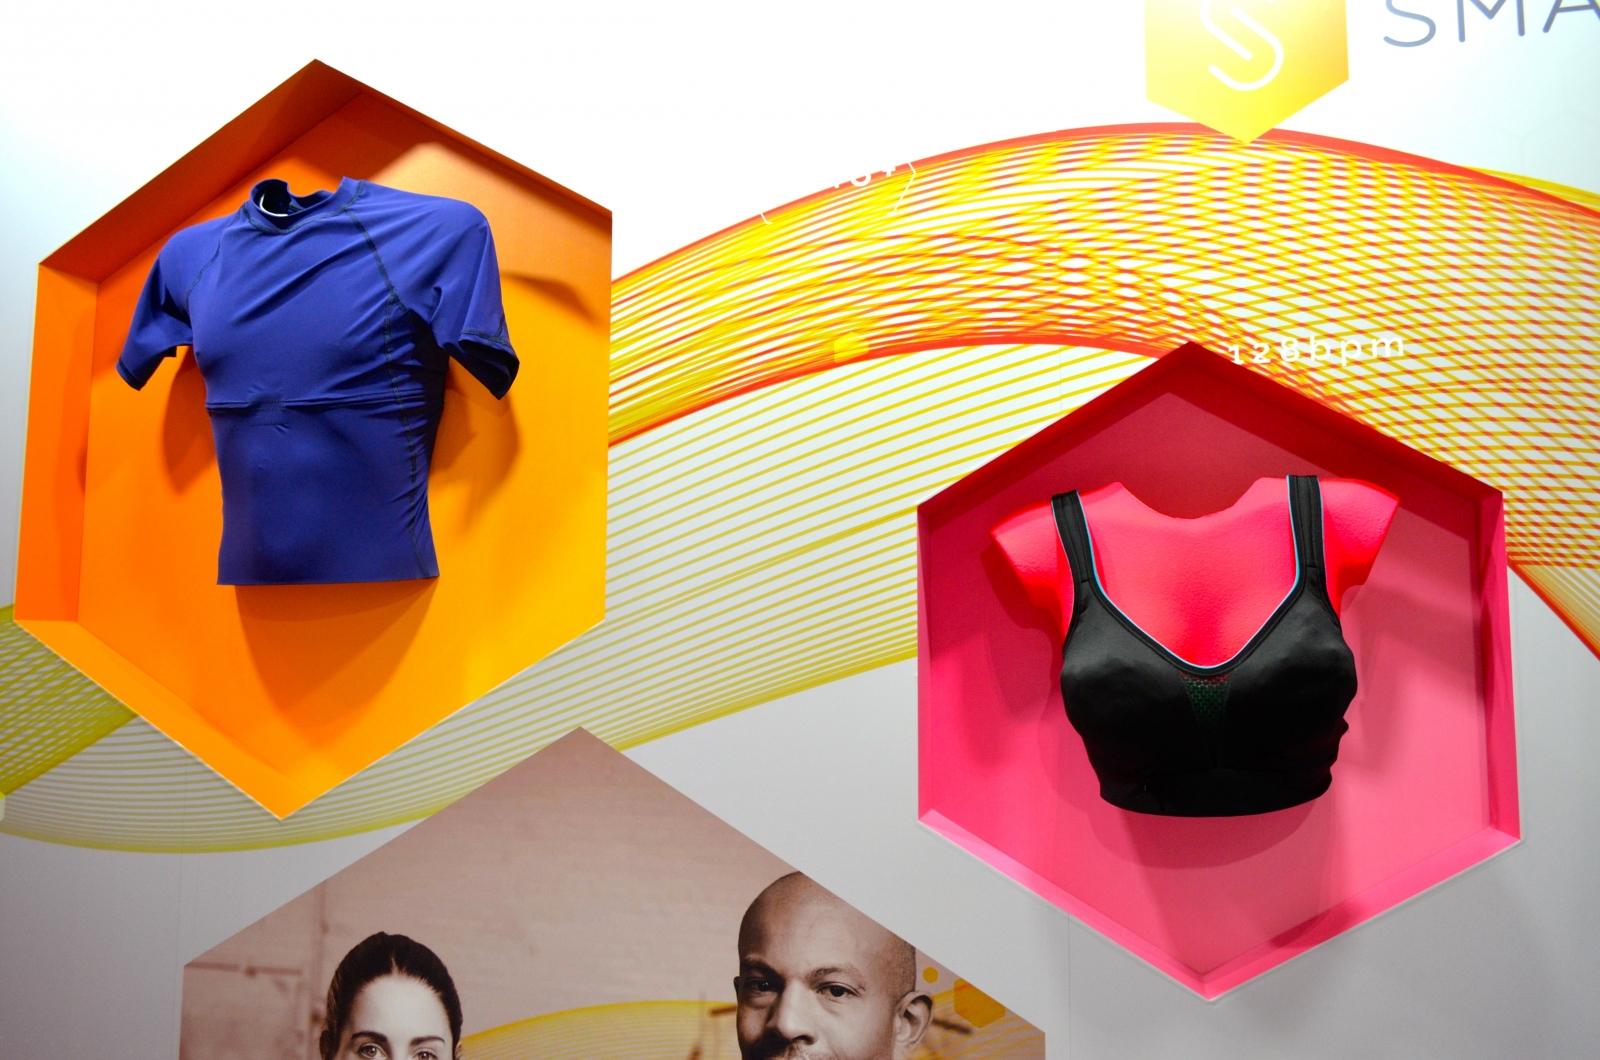 Smart Life wearable technology